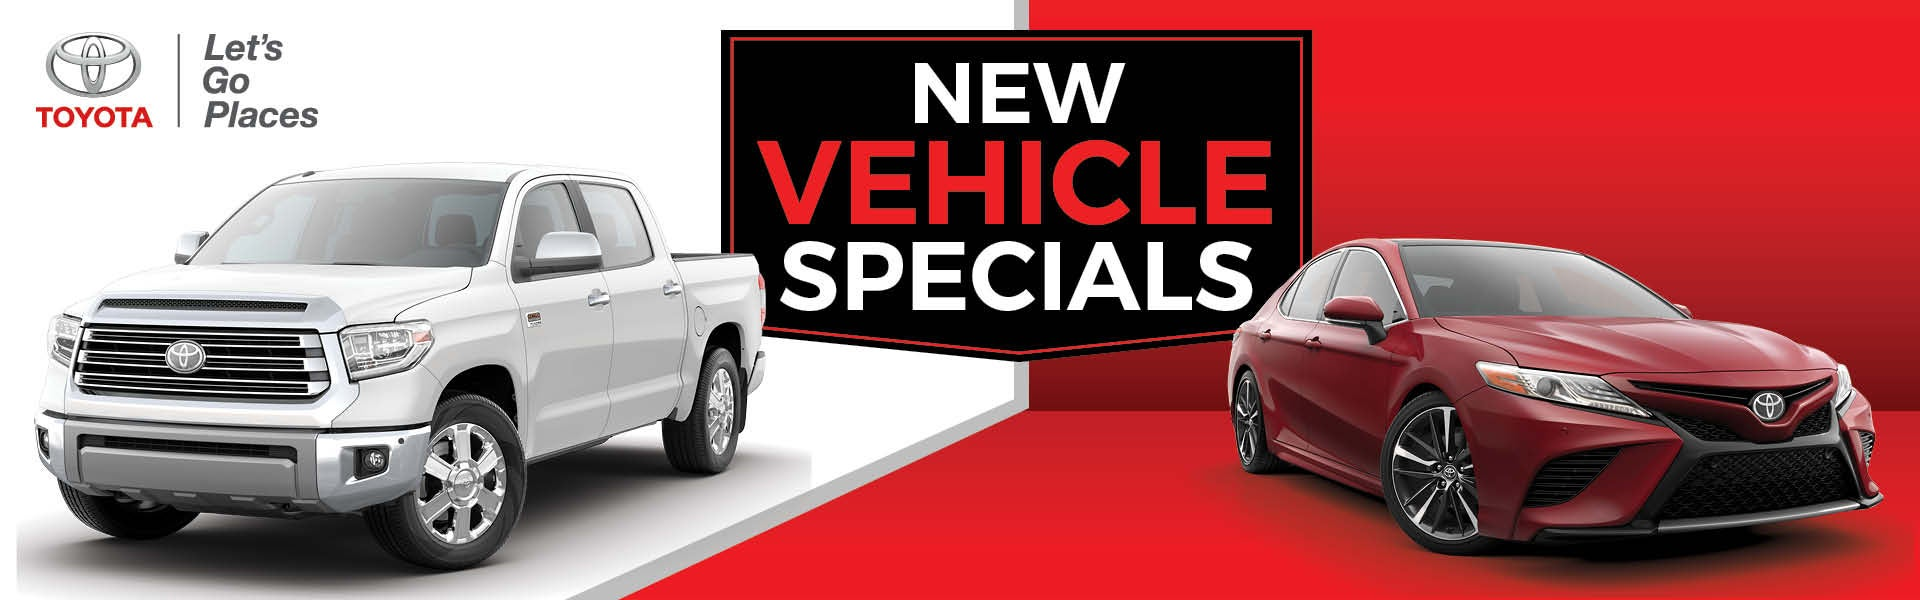 Toyota New Car Specials Clarksville Tn Area Toyota Dealer Near